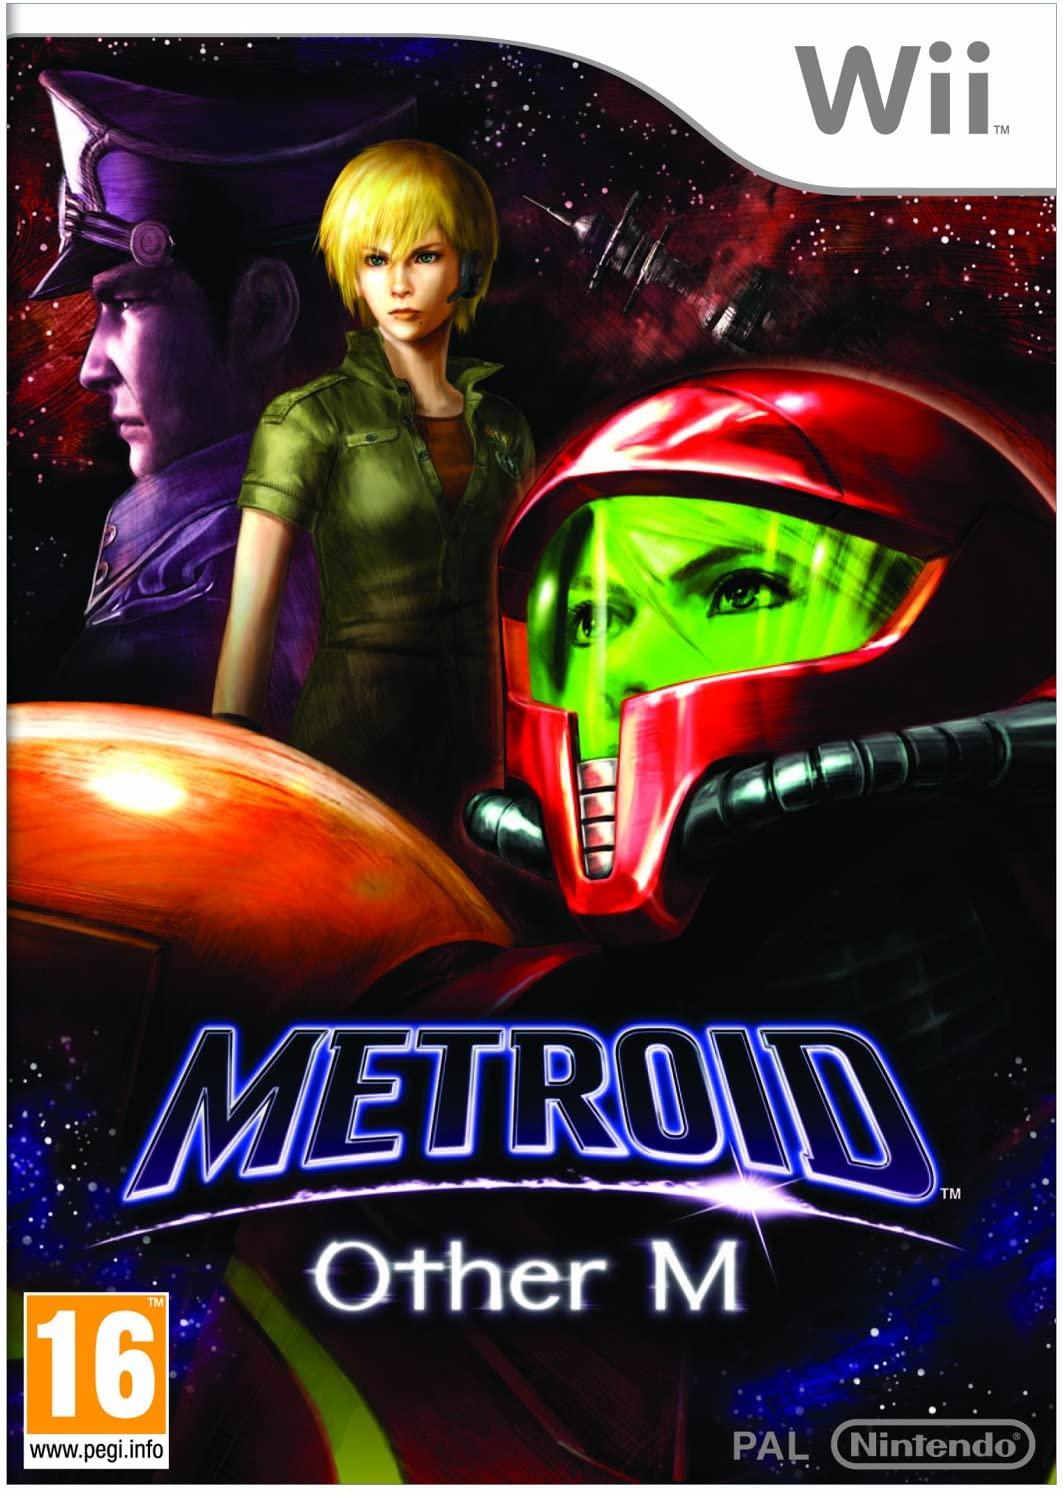 Nintendo Wii: Metroid - Other M